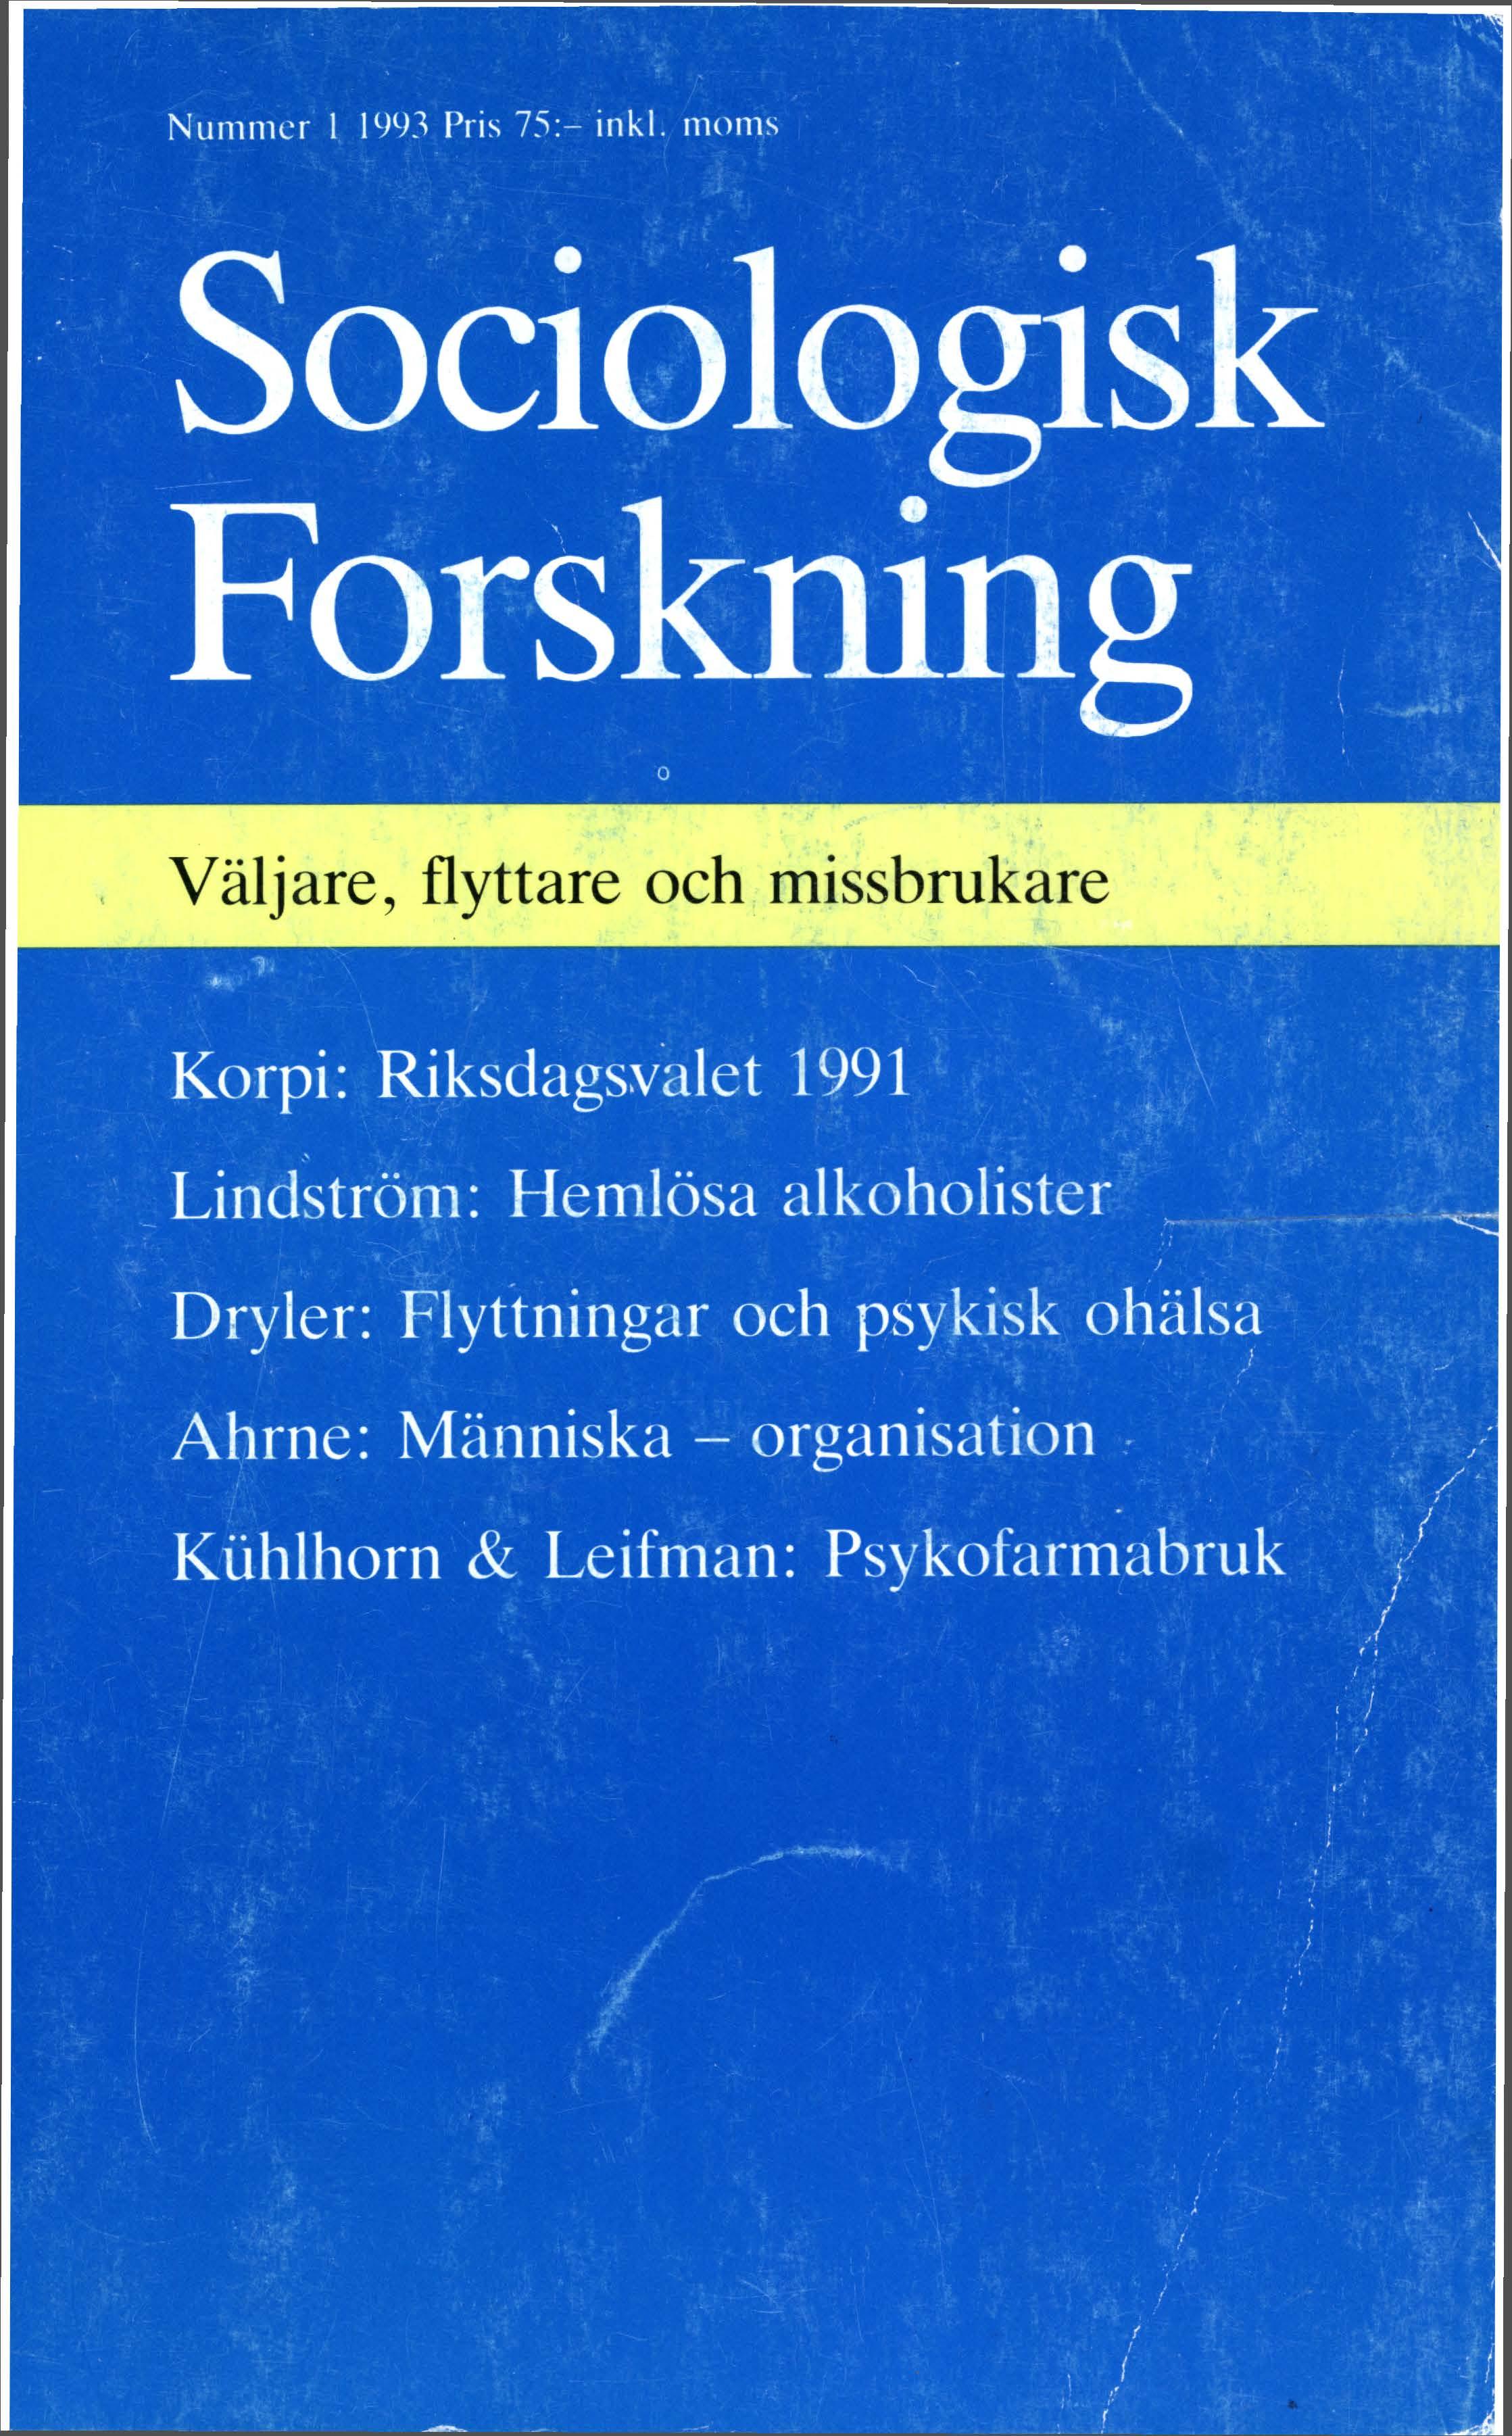 Visa Vol 30 Nr 1 (1993)